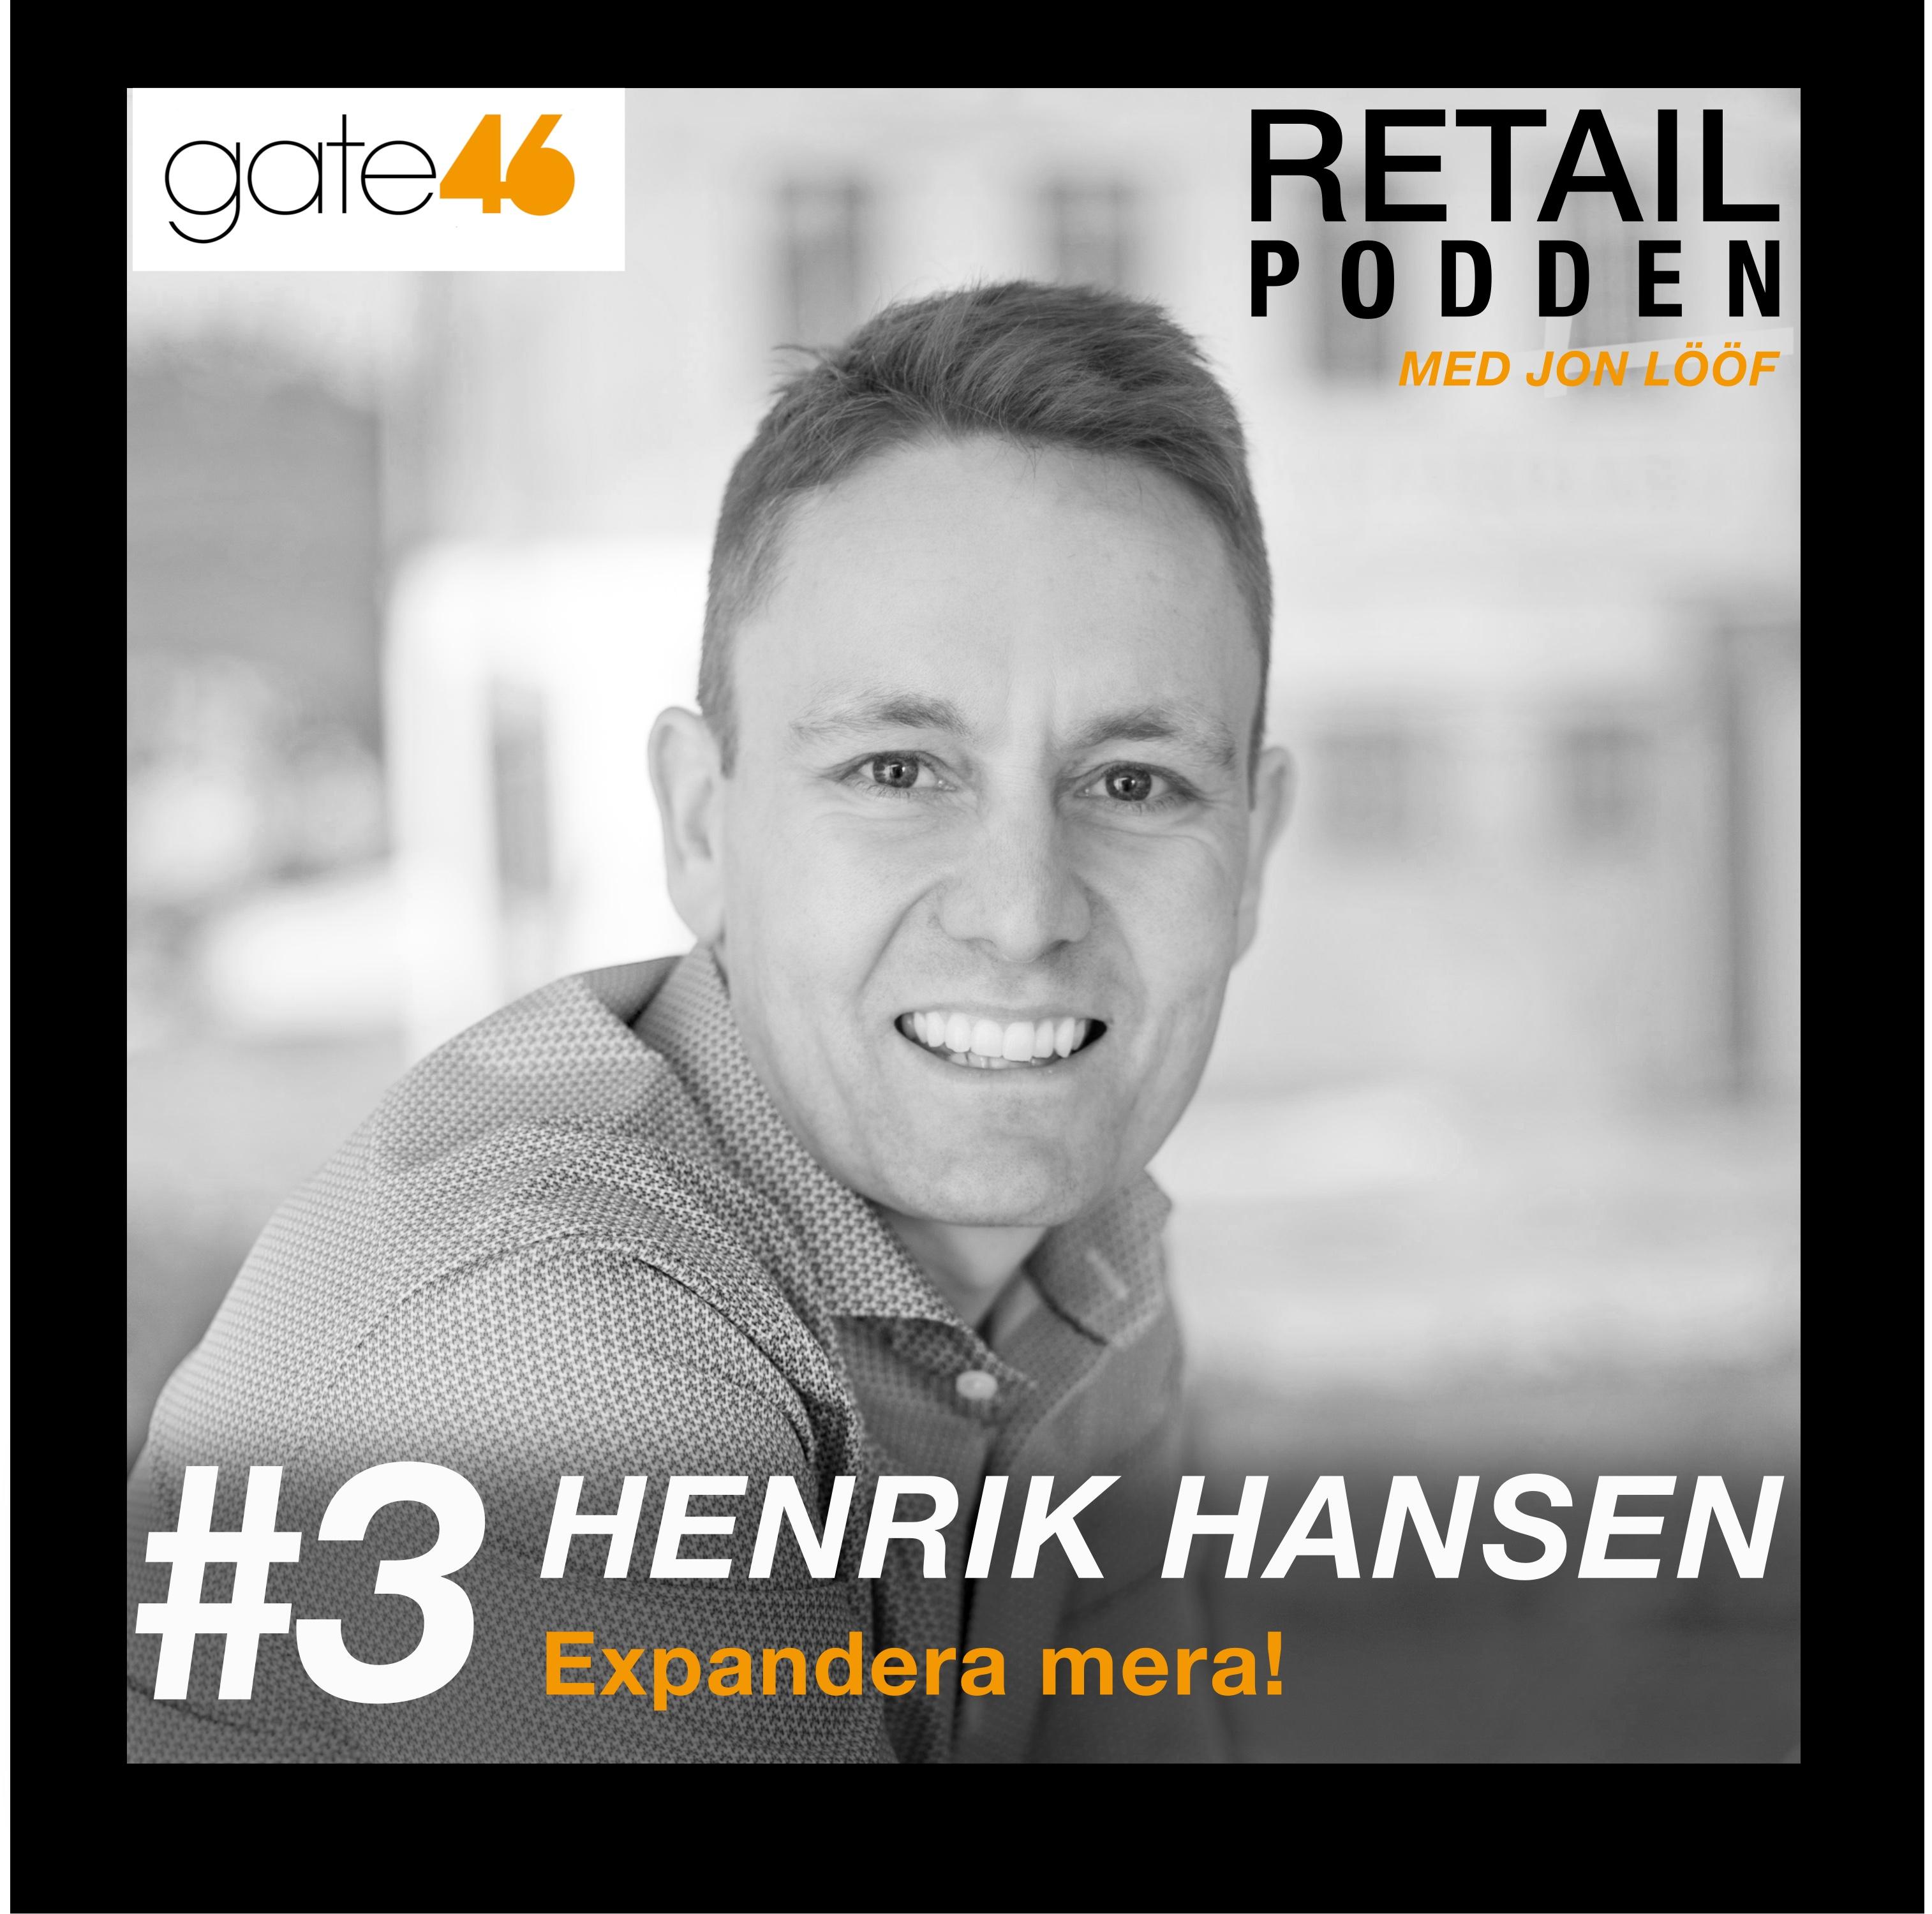 3. Henrik Hansen - Expandera mera!